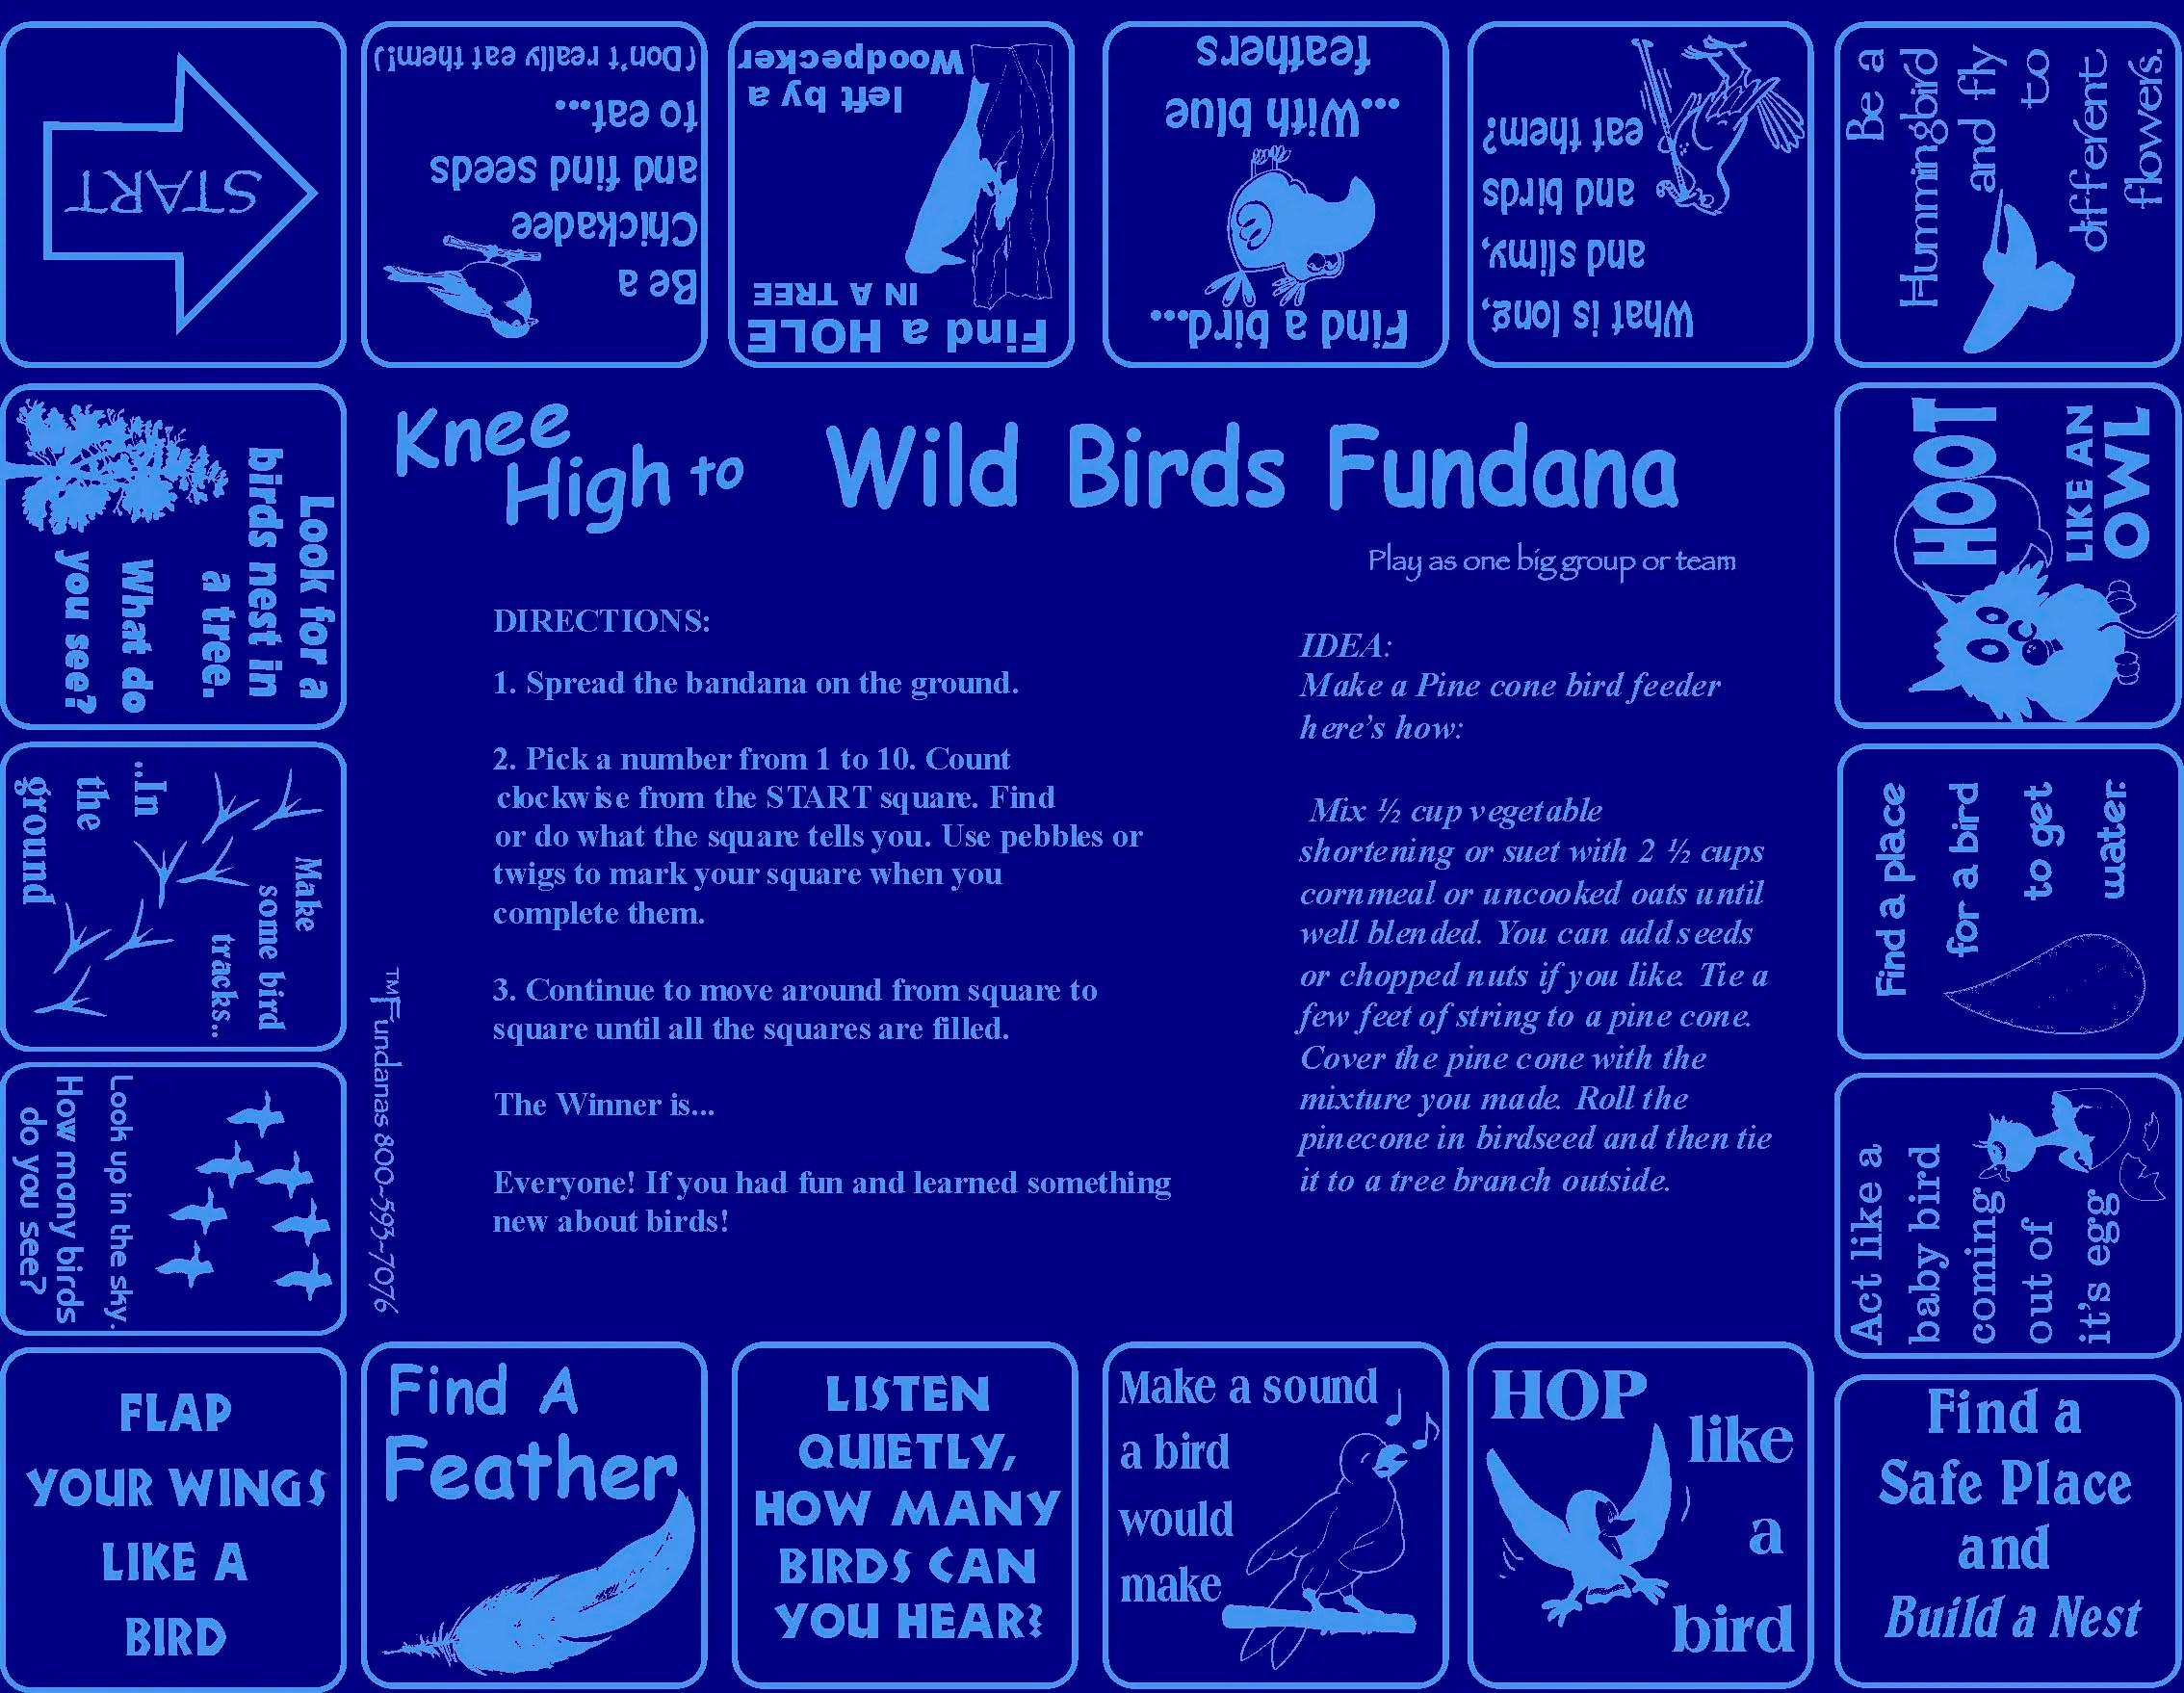 Birds Backyard Scavenger Hunt Game About Birds For Kids